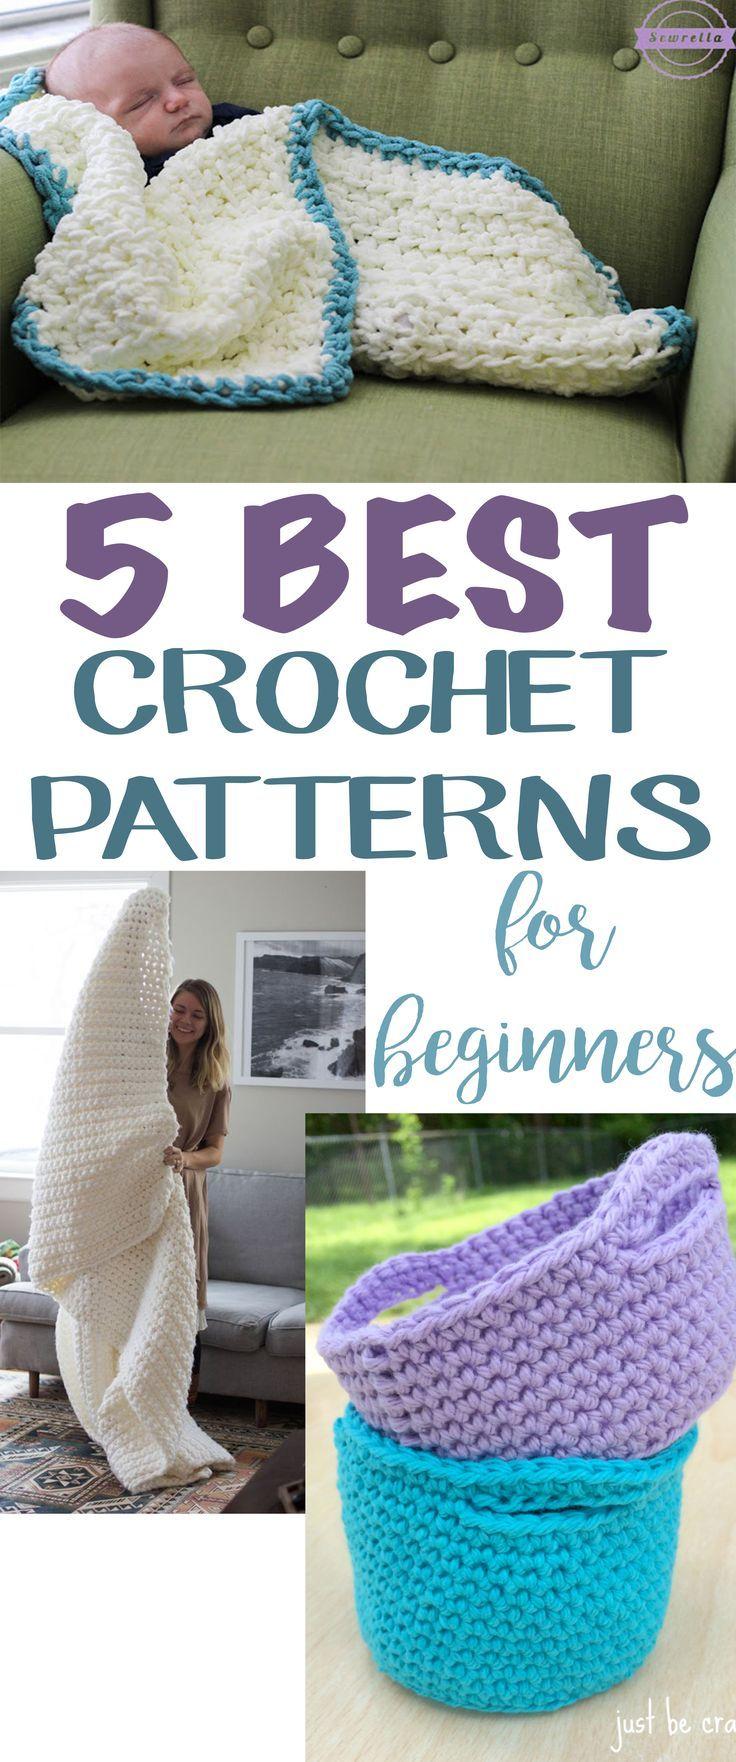 5 Best Patterns for Crochet Beginners | Easy crochet patterns, Easy ...